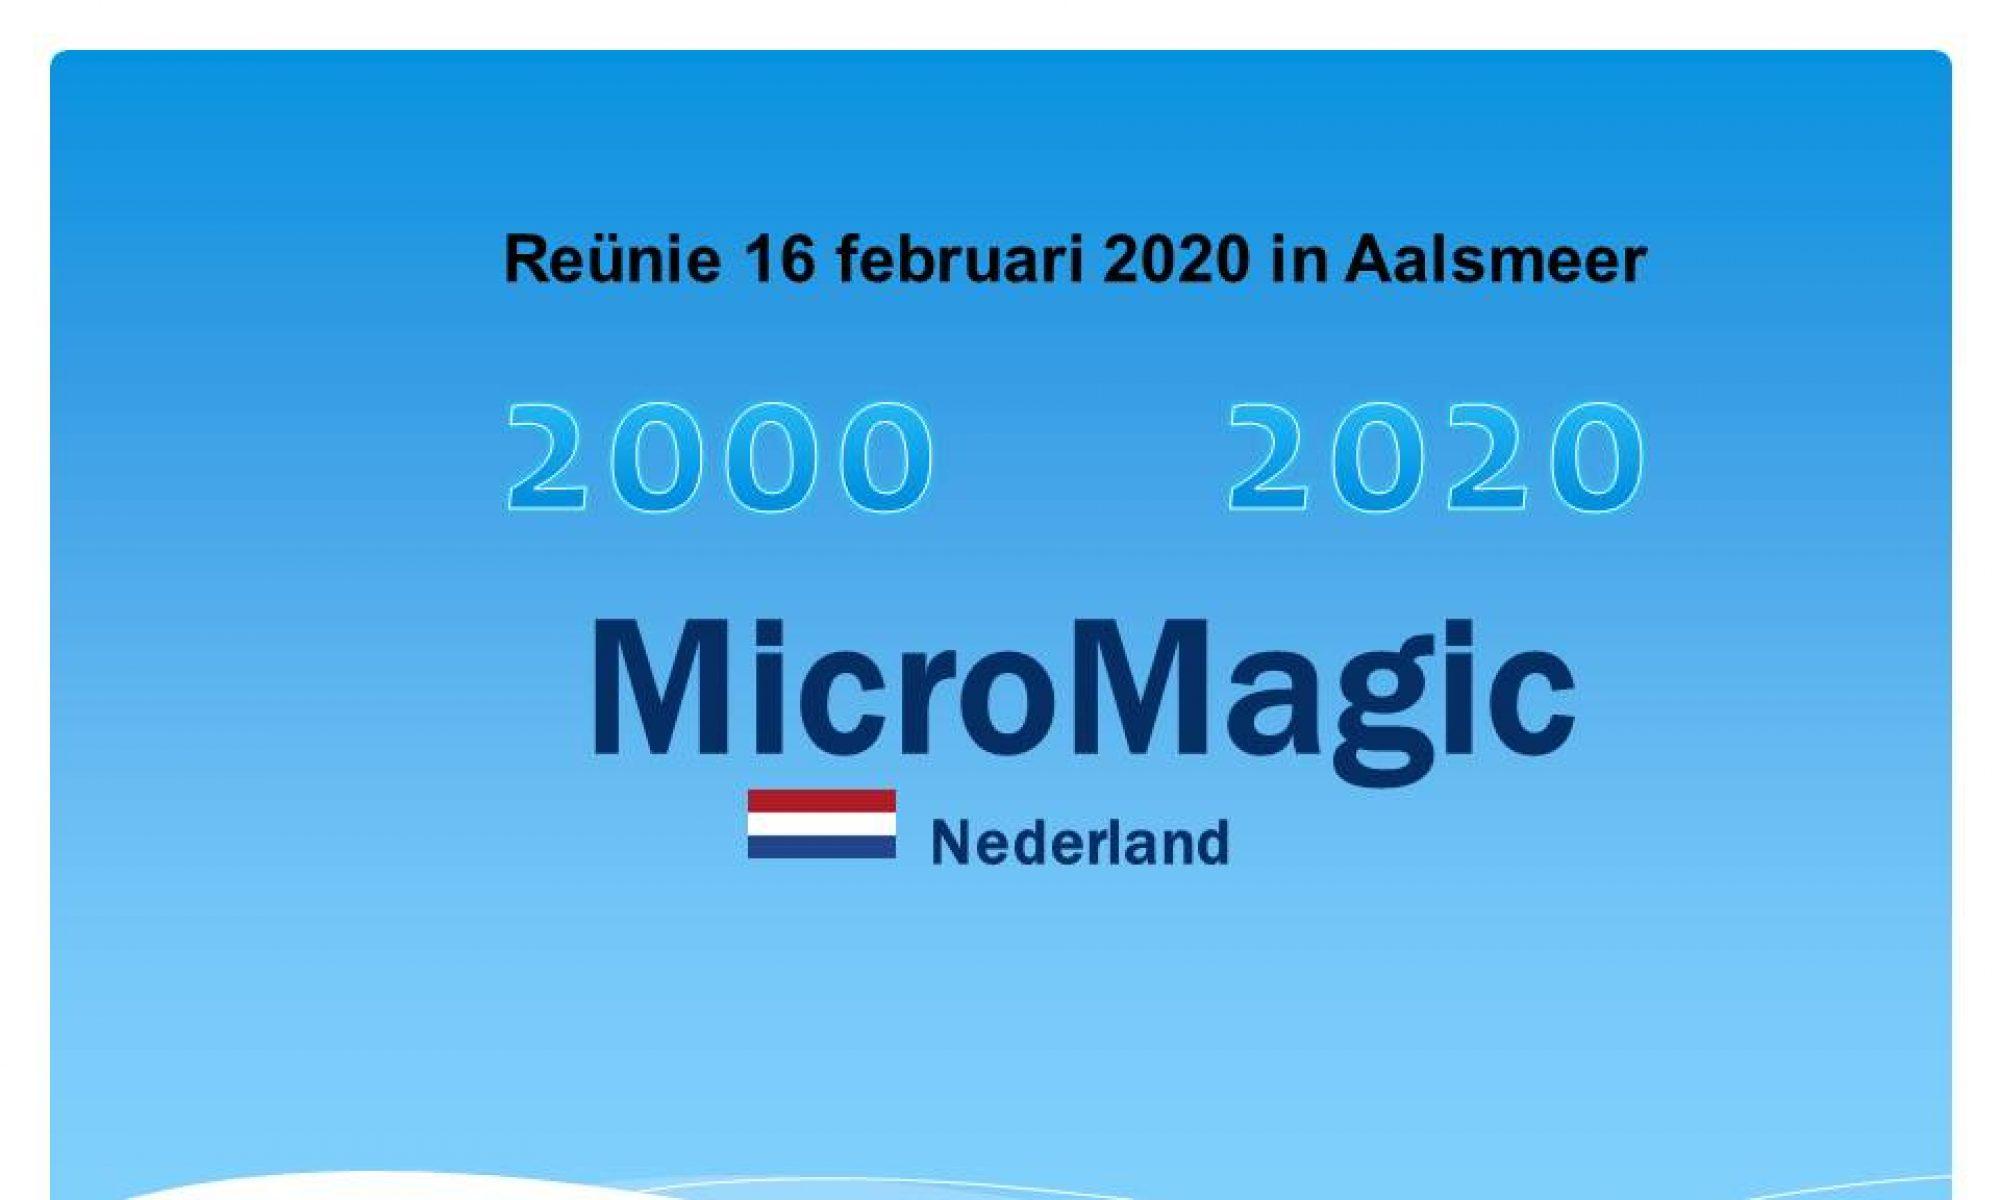 Micro Magic Nederland